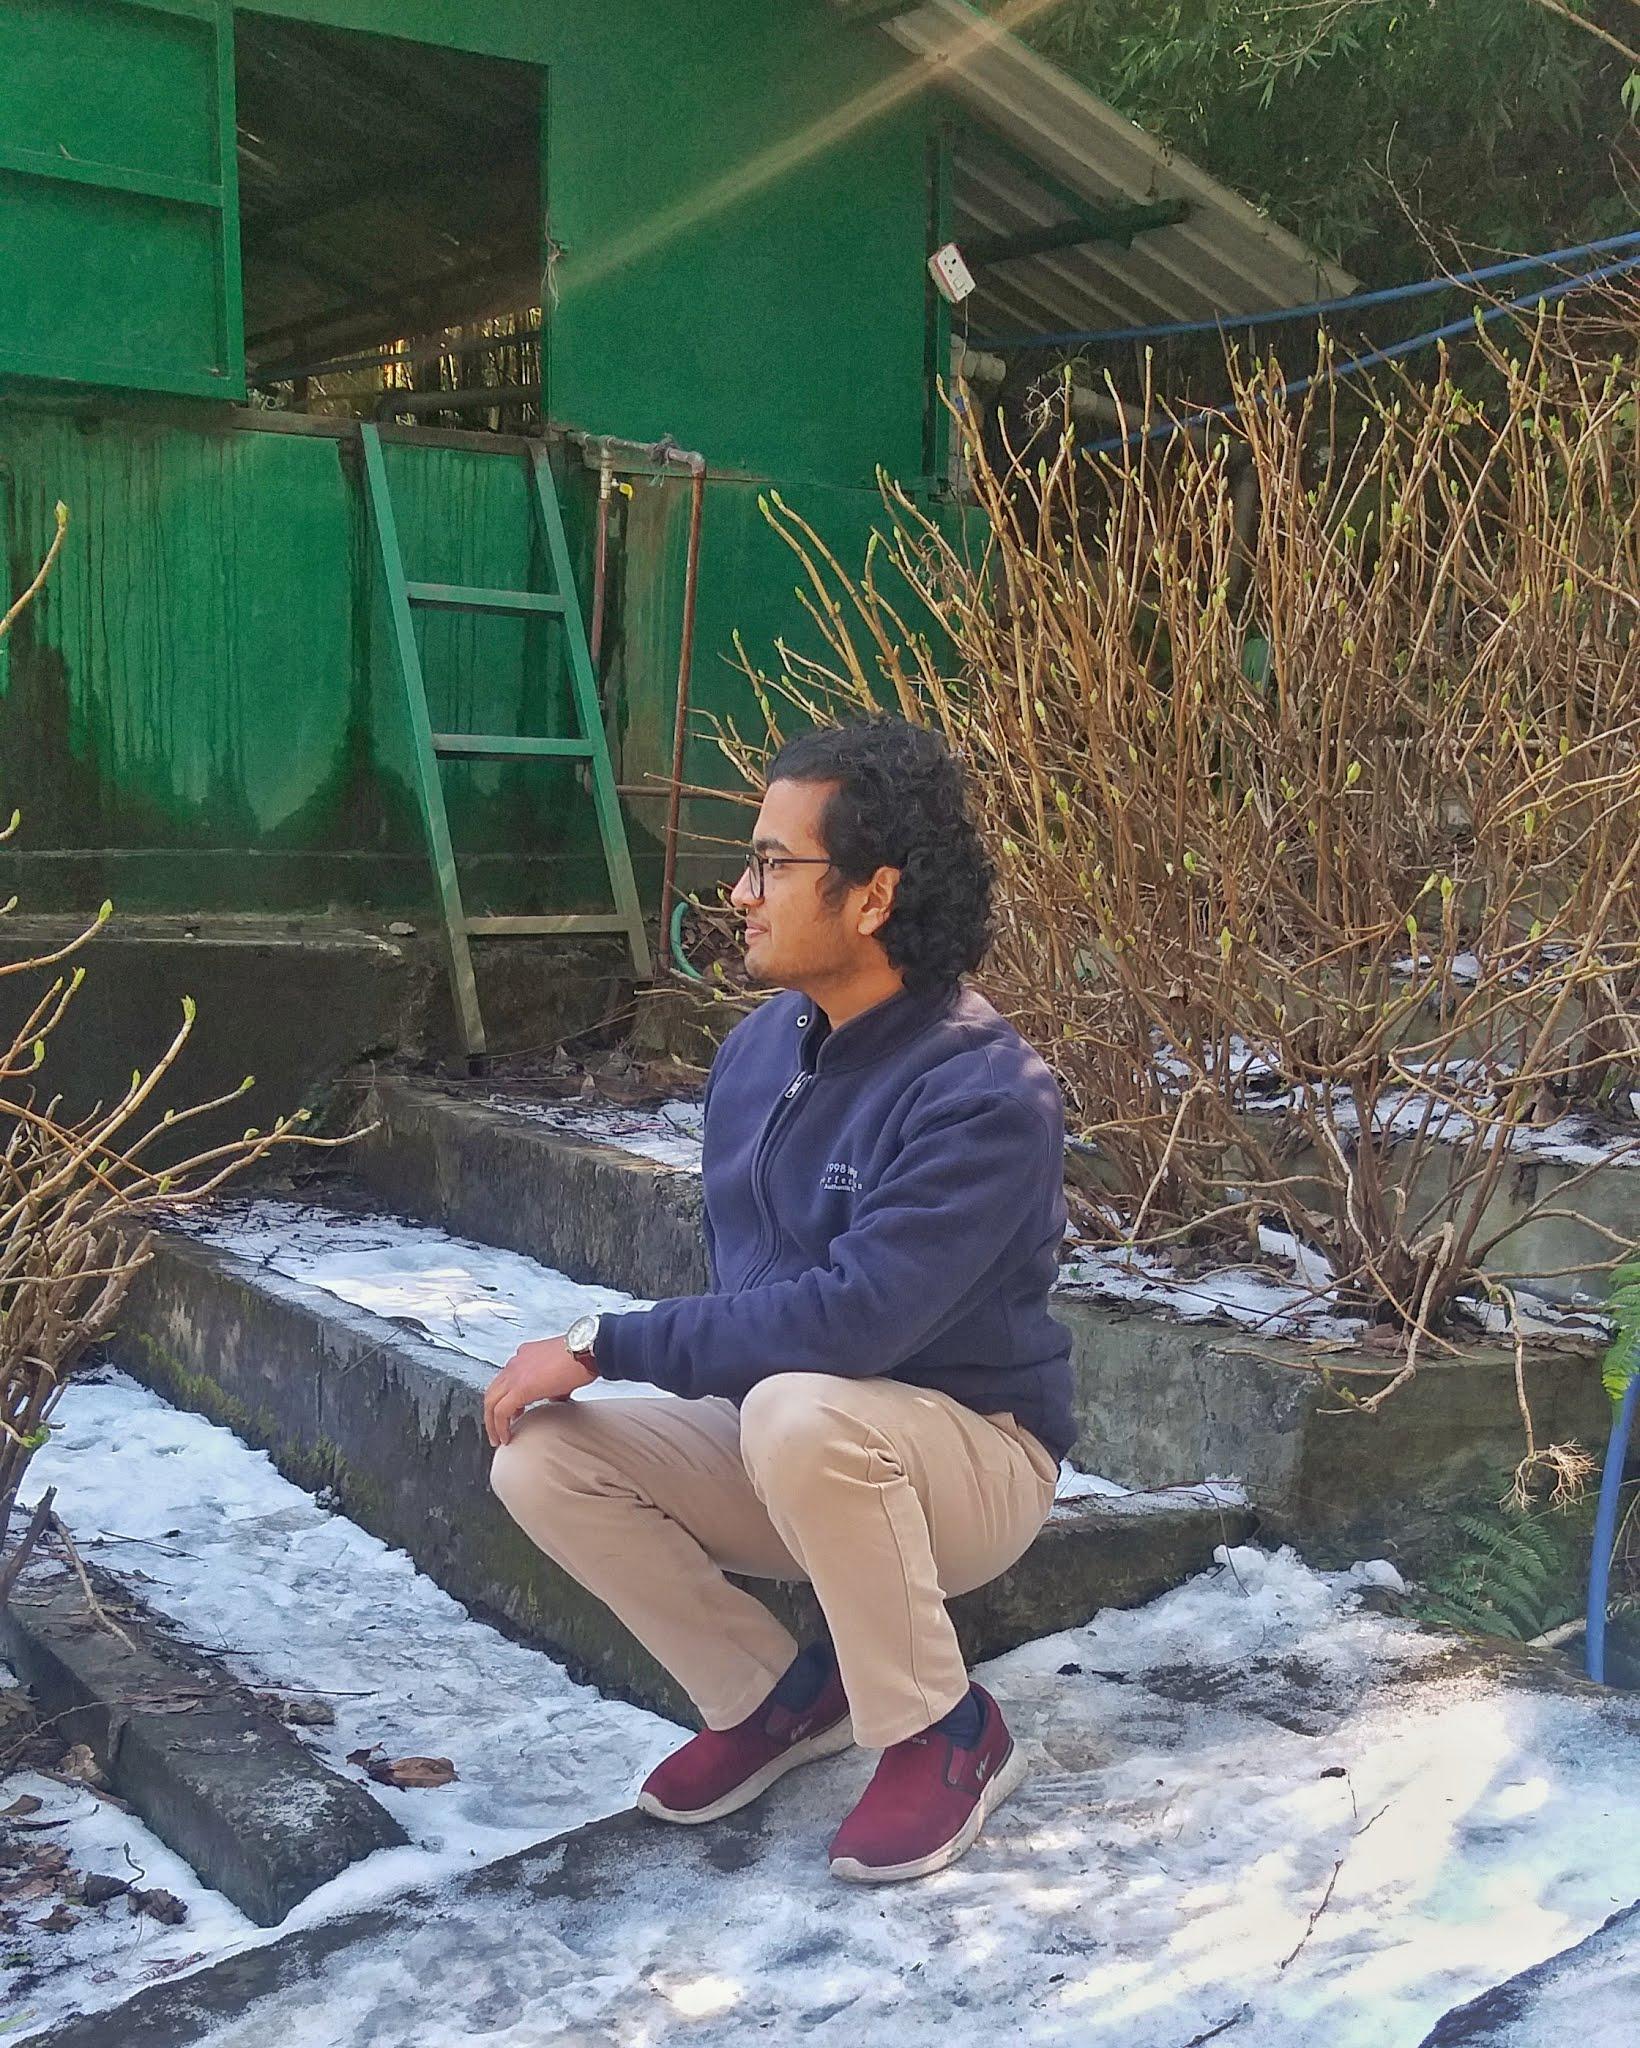 snowfall, mussoorie, mall road, company garden, shiv sangal, dehradun, uttarakhand